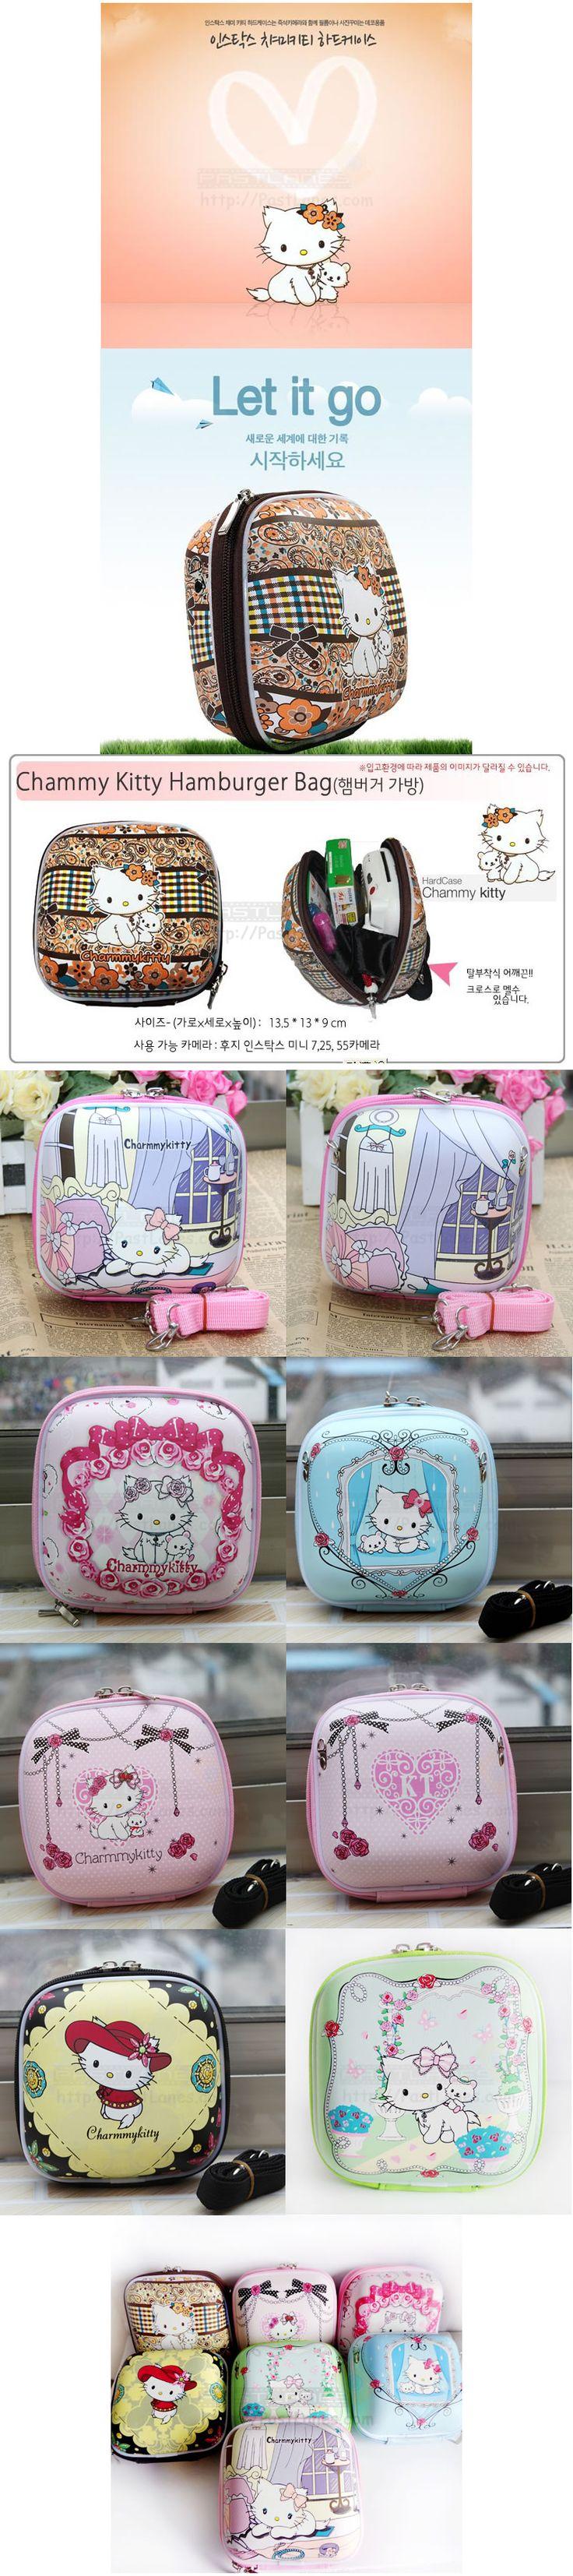 Hello Kitty Hamburger Case For Instax Mini 8, Mini 7S, Mini 25, Mini 50S